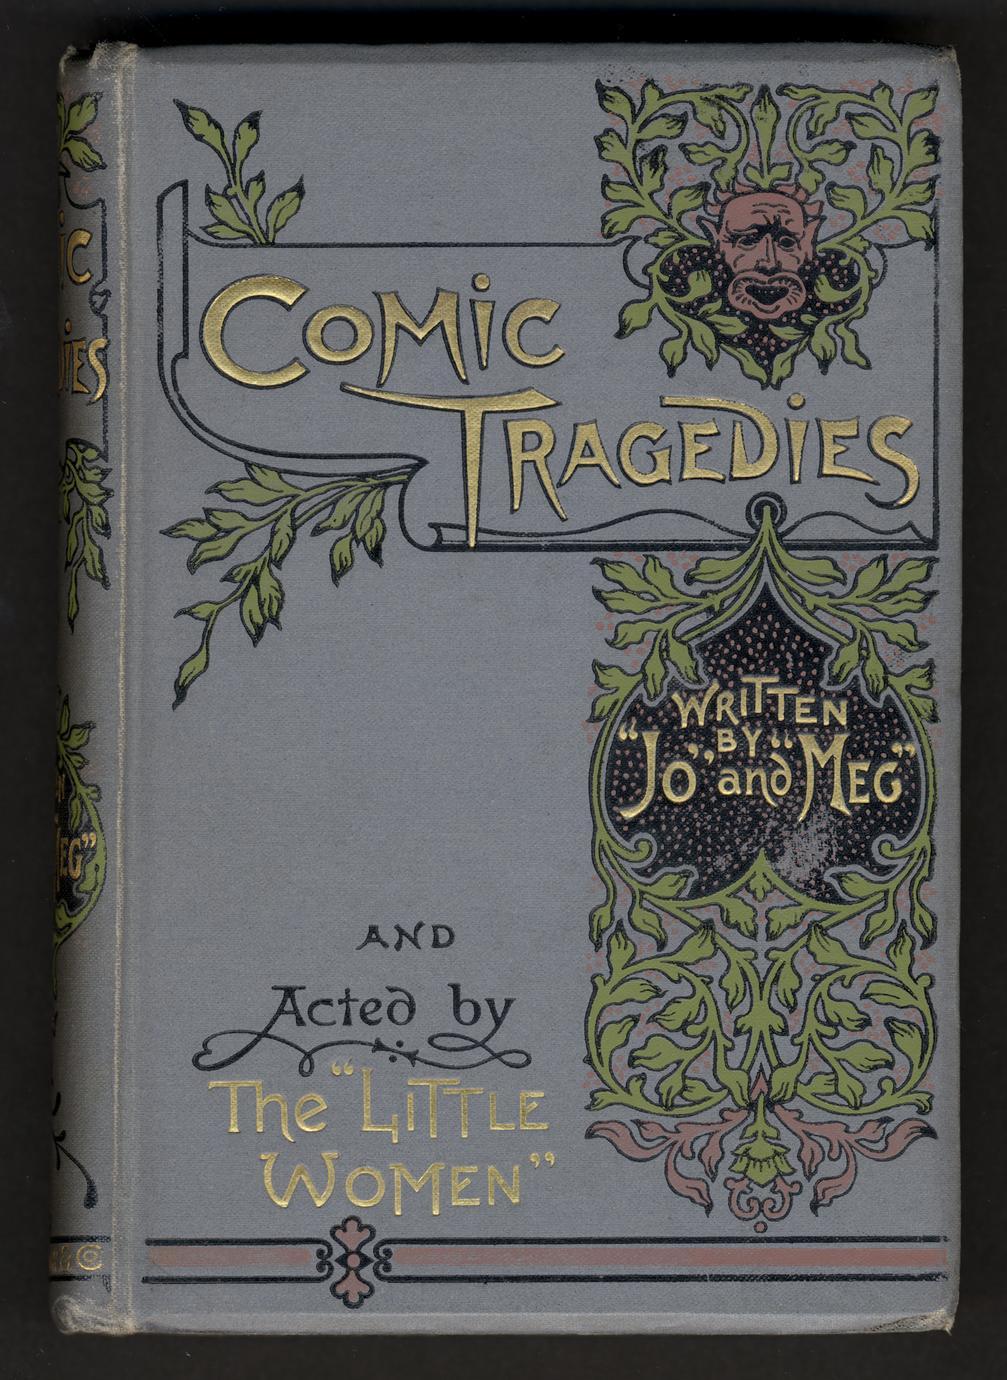 Comic tragedies (1 of 3)